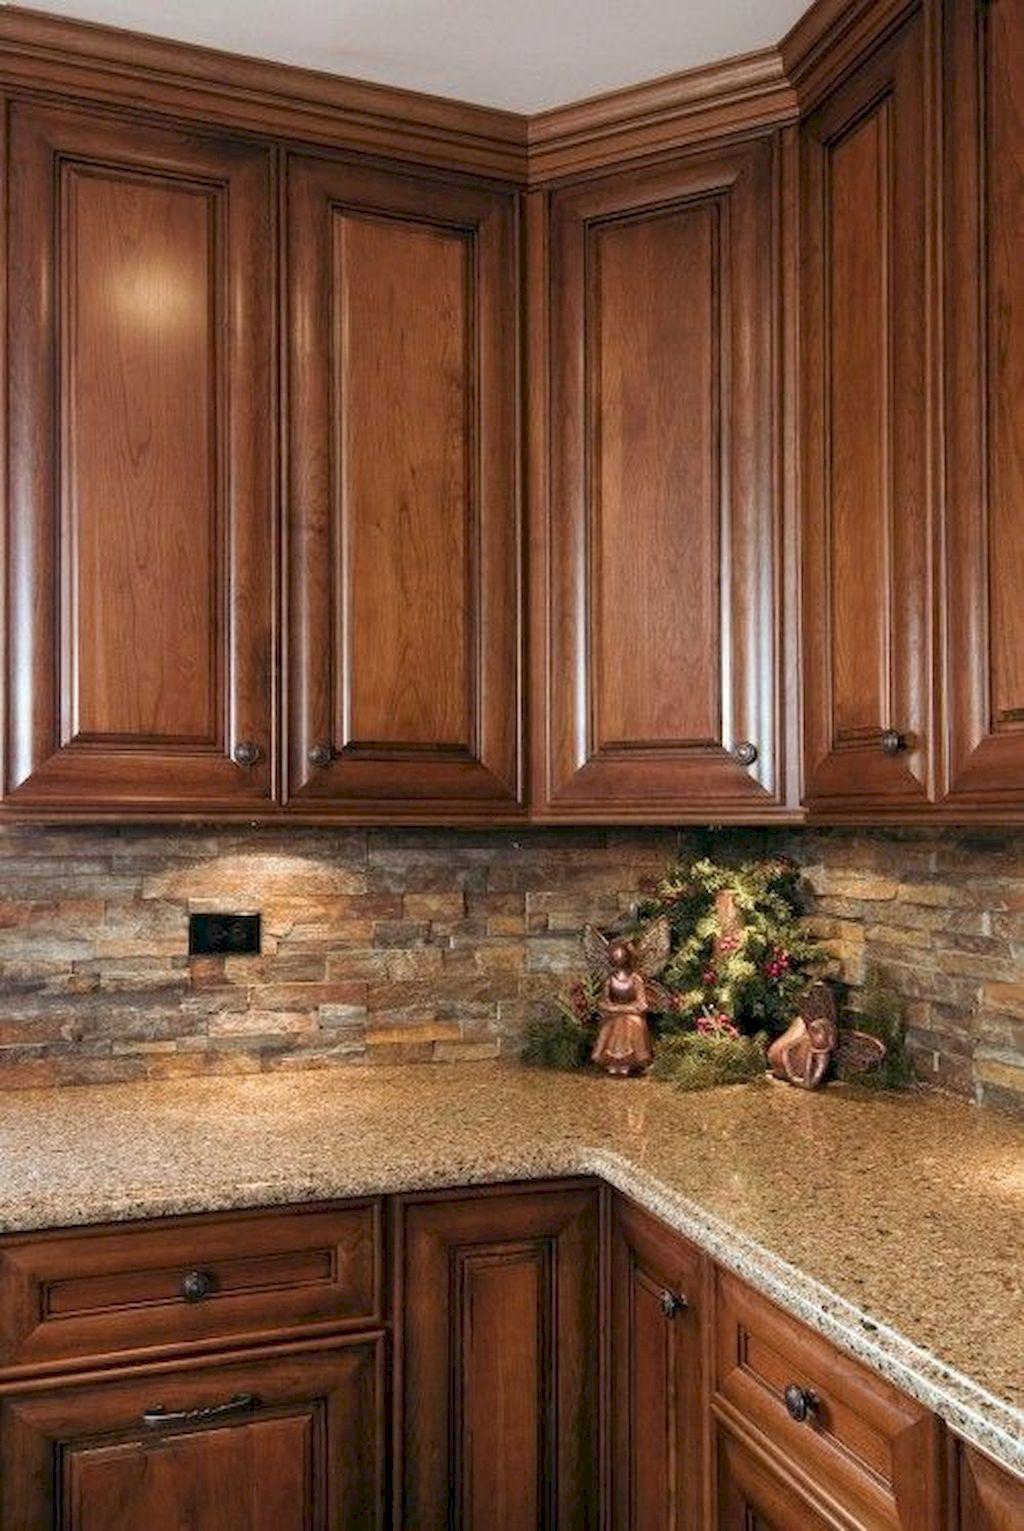 Best Rustic Farmhouse Kitchen Cabinet Makeover Ideas 48 Homespecially Kitchen Renovation Rustic Kitchen Oak Kitchen